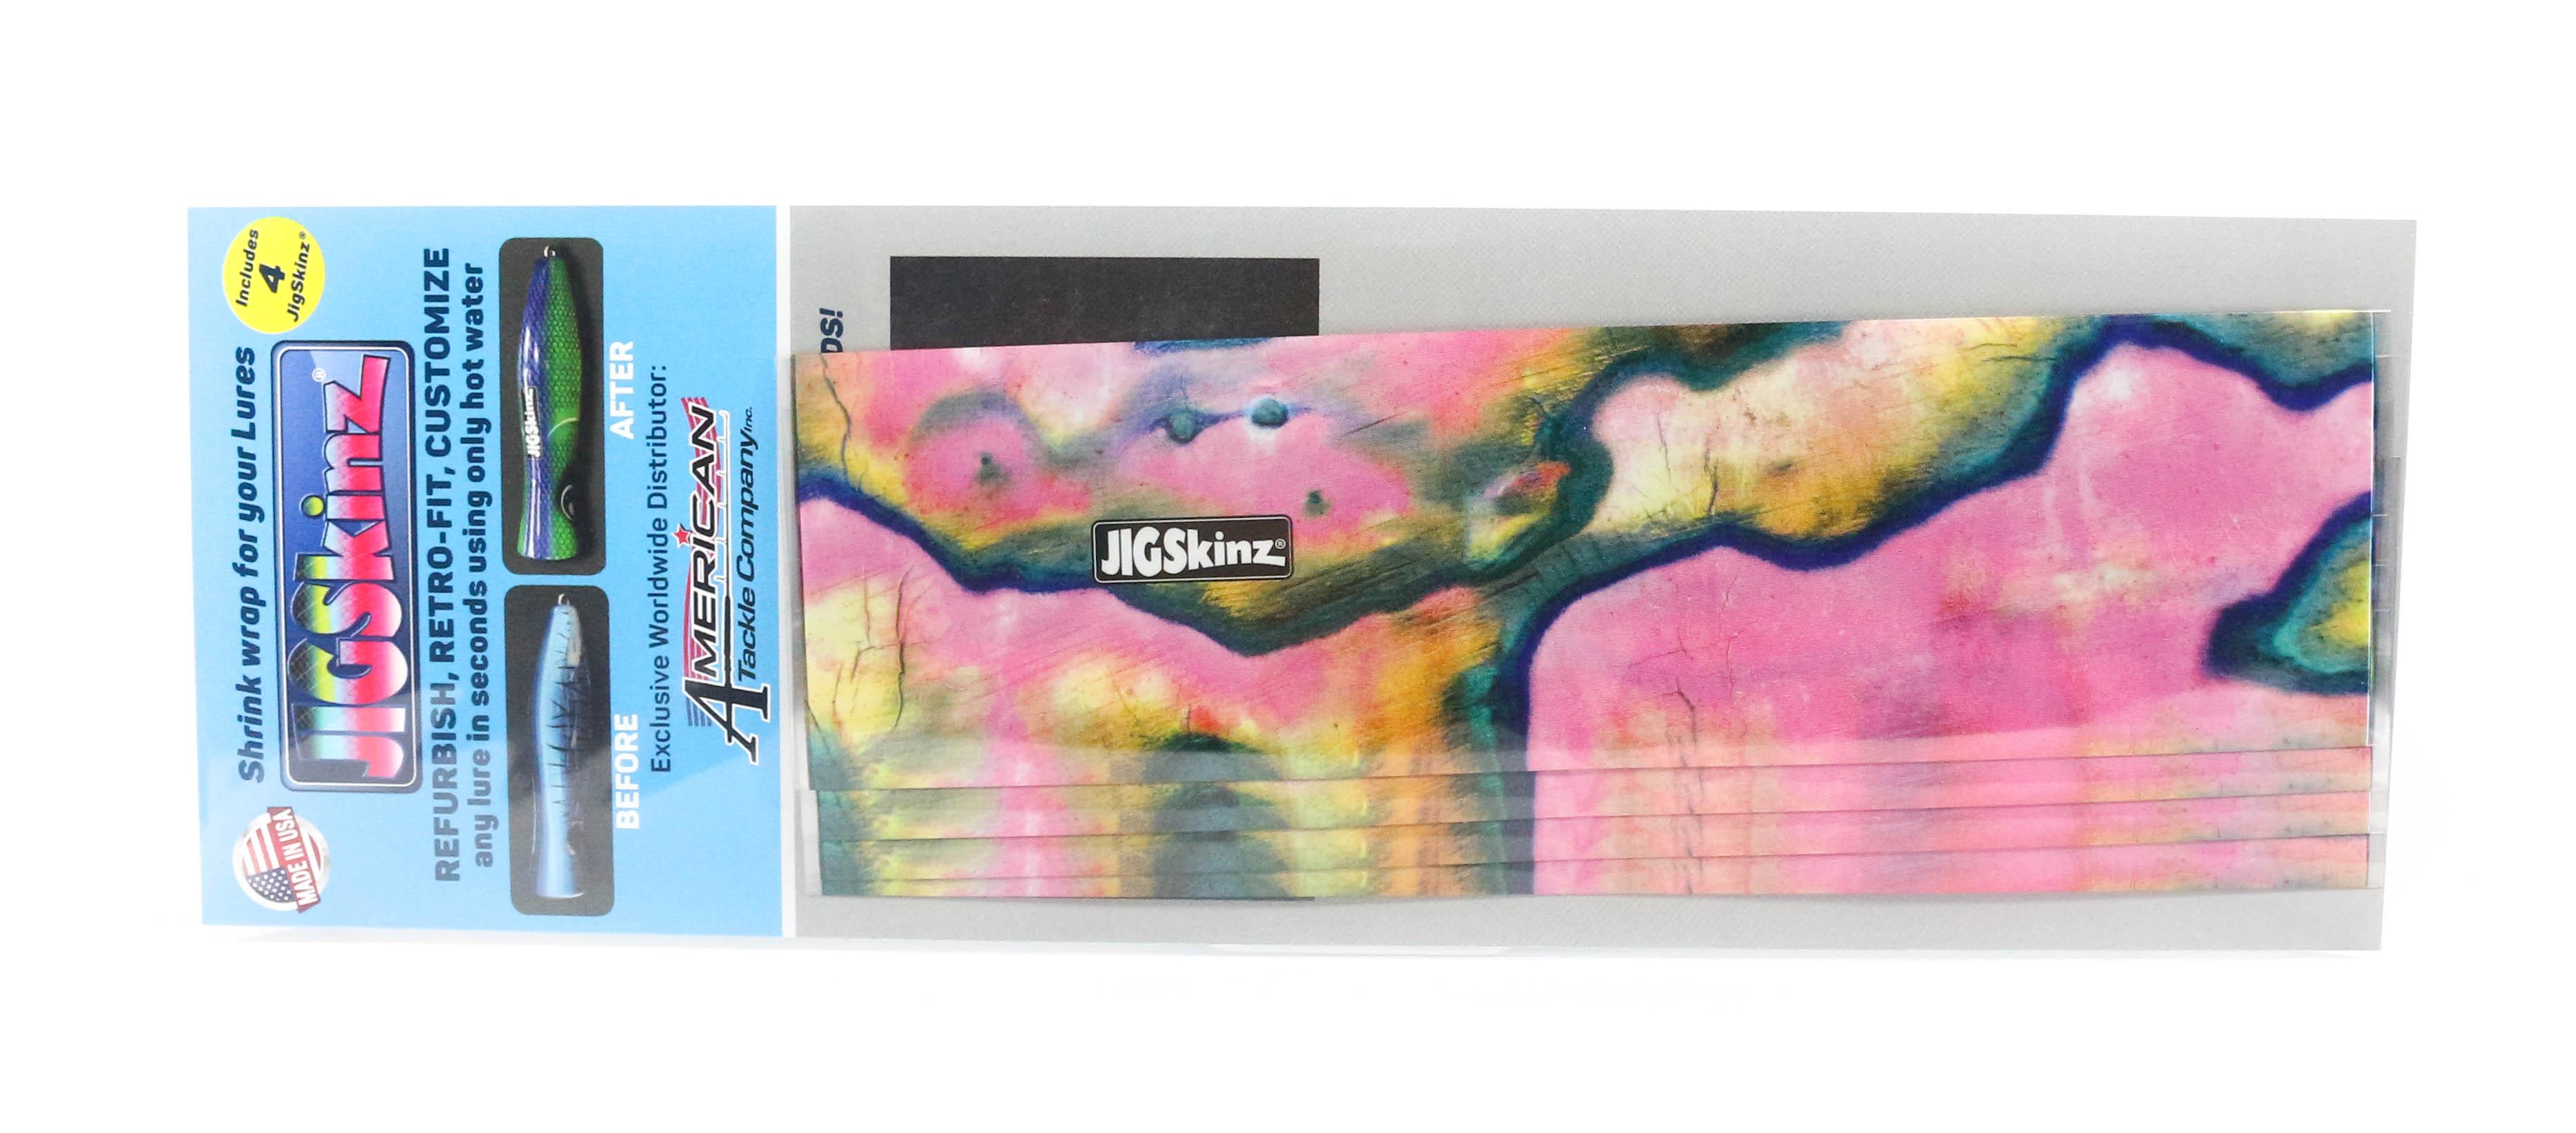 Jigskinz JZABPK-L4 Abalone Pink 200 x 110mm x 4 pieces Large (3282)